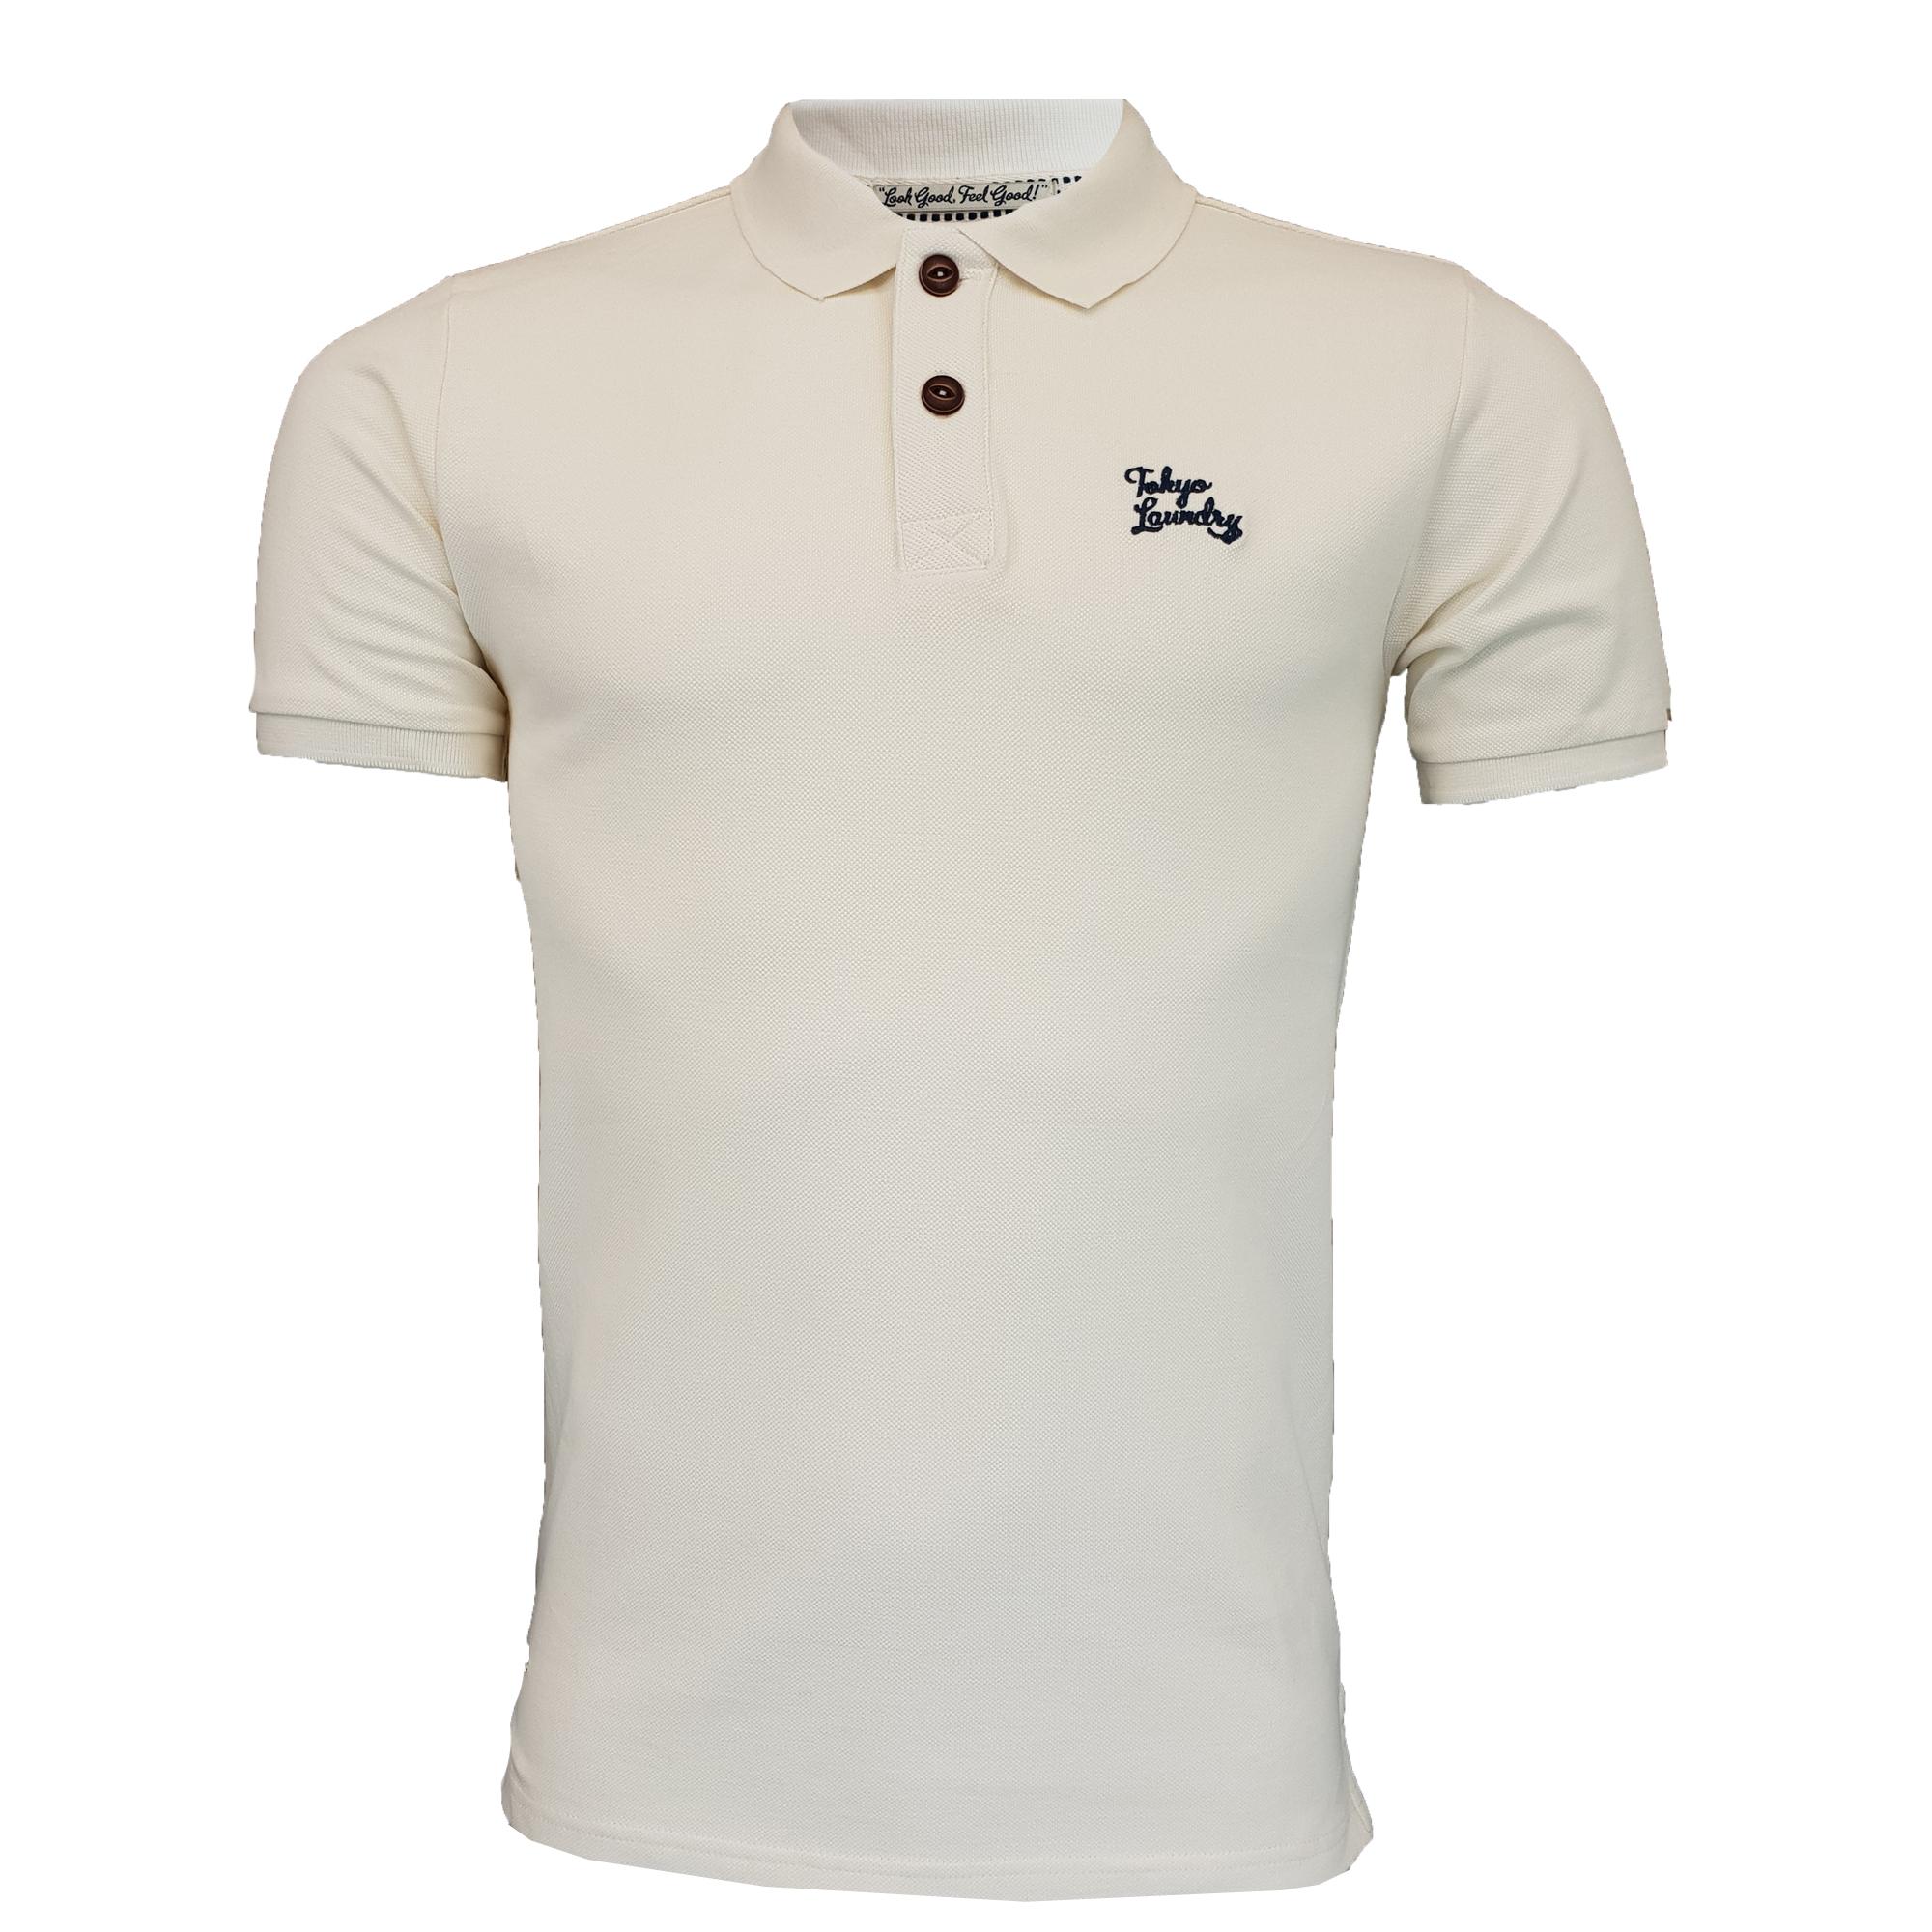 Mens-Pique-Polo-T-Shirt-Tokyo-Laundry-Florenzi-Short-Sleeved-Top-Casual-Summer thumbnail 7